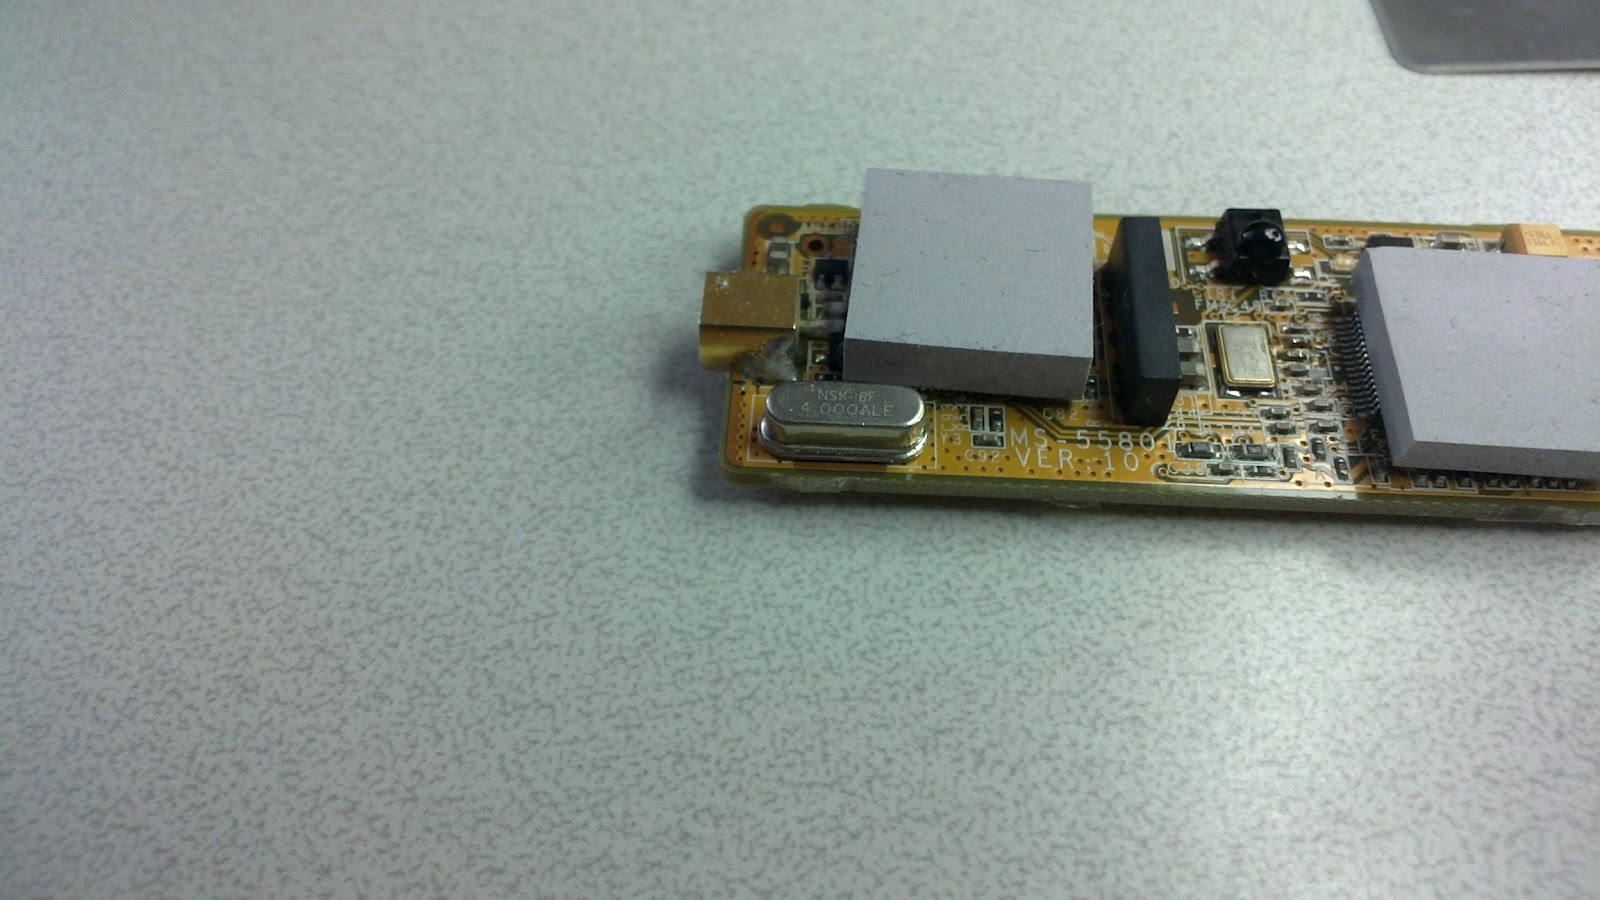 Basic DVB-T Stick